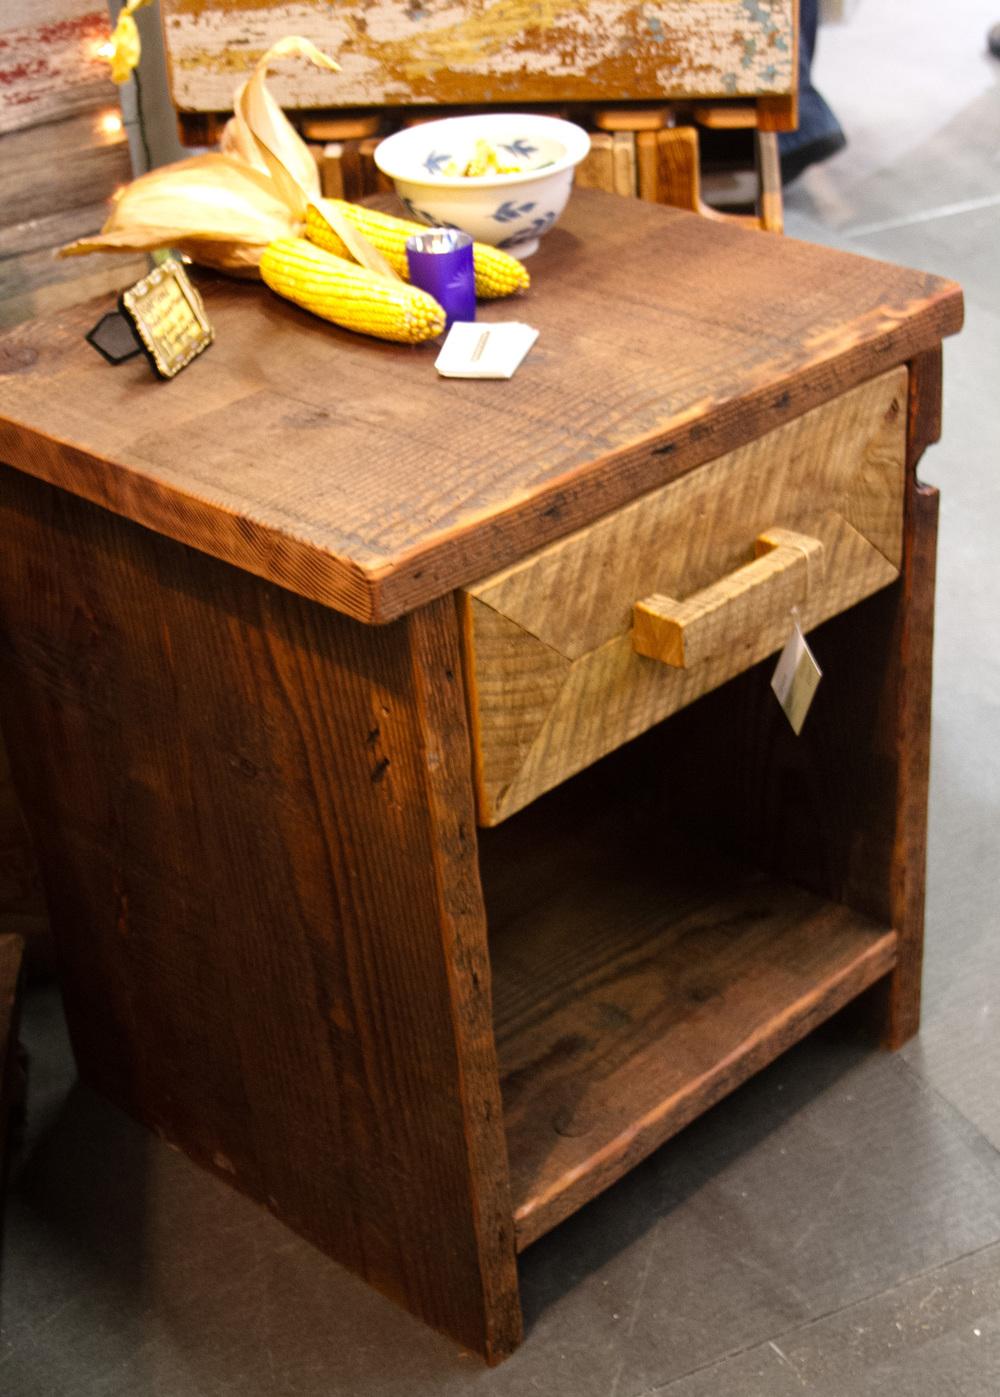 ludlow barnwood_custom furn 4.jpg